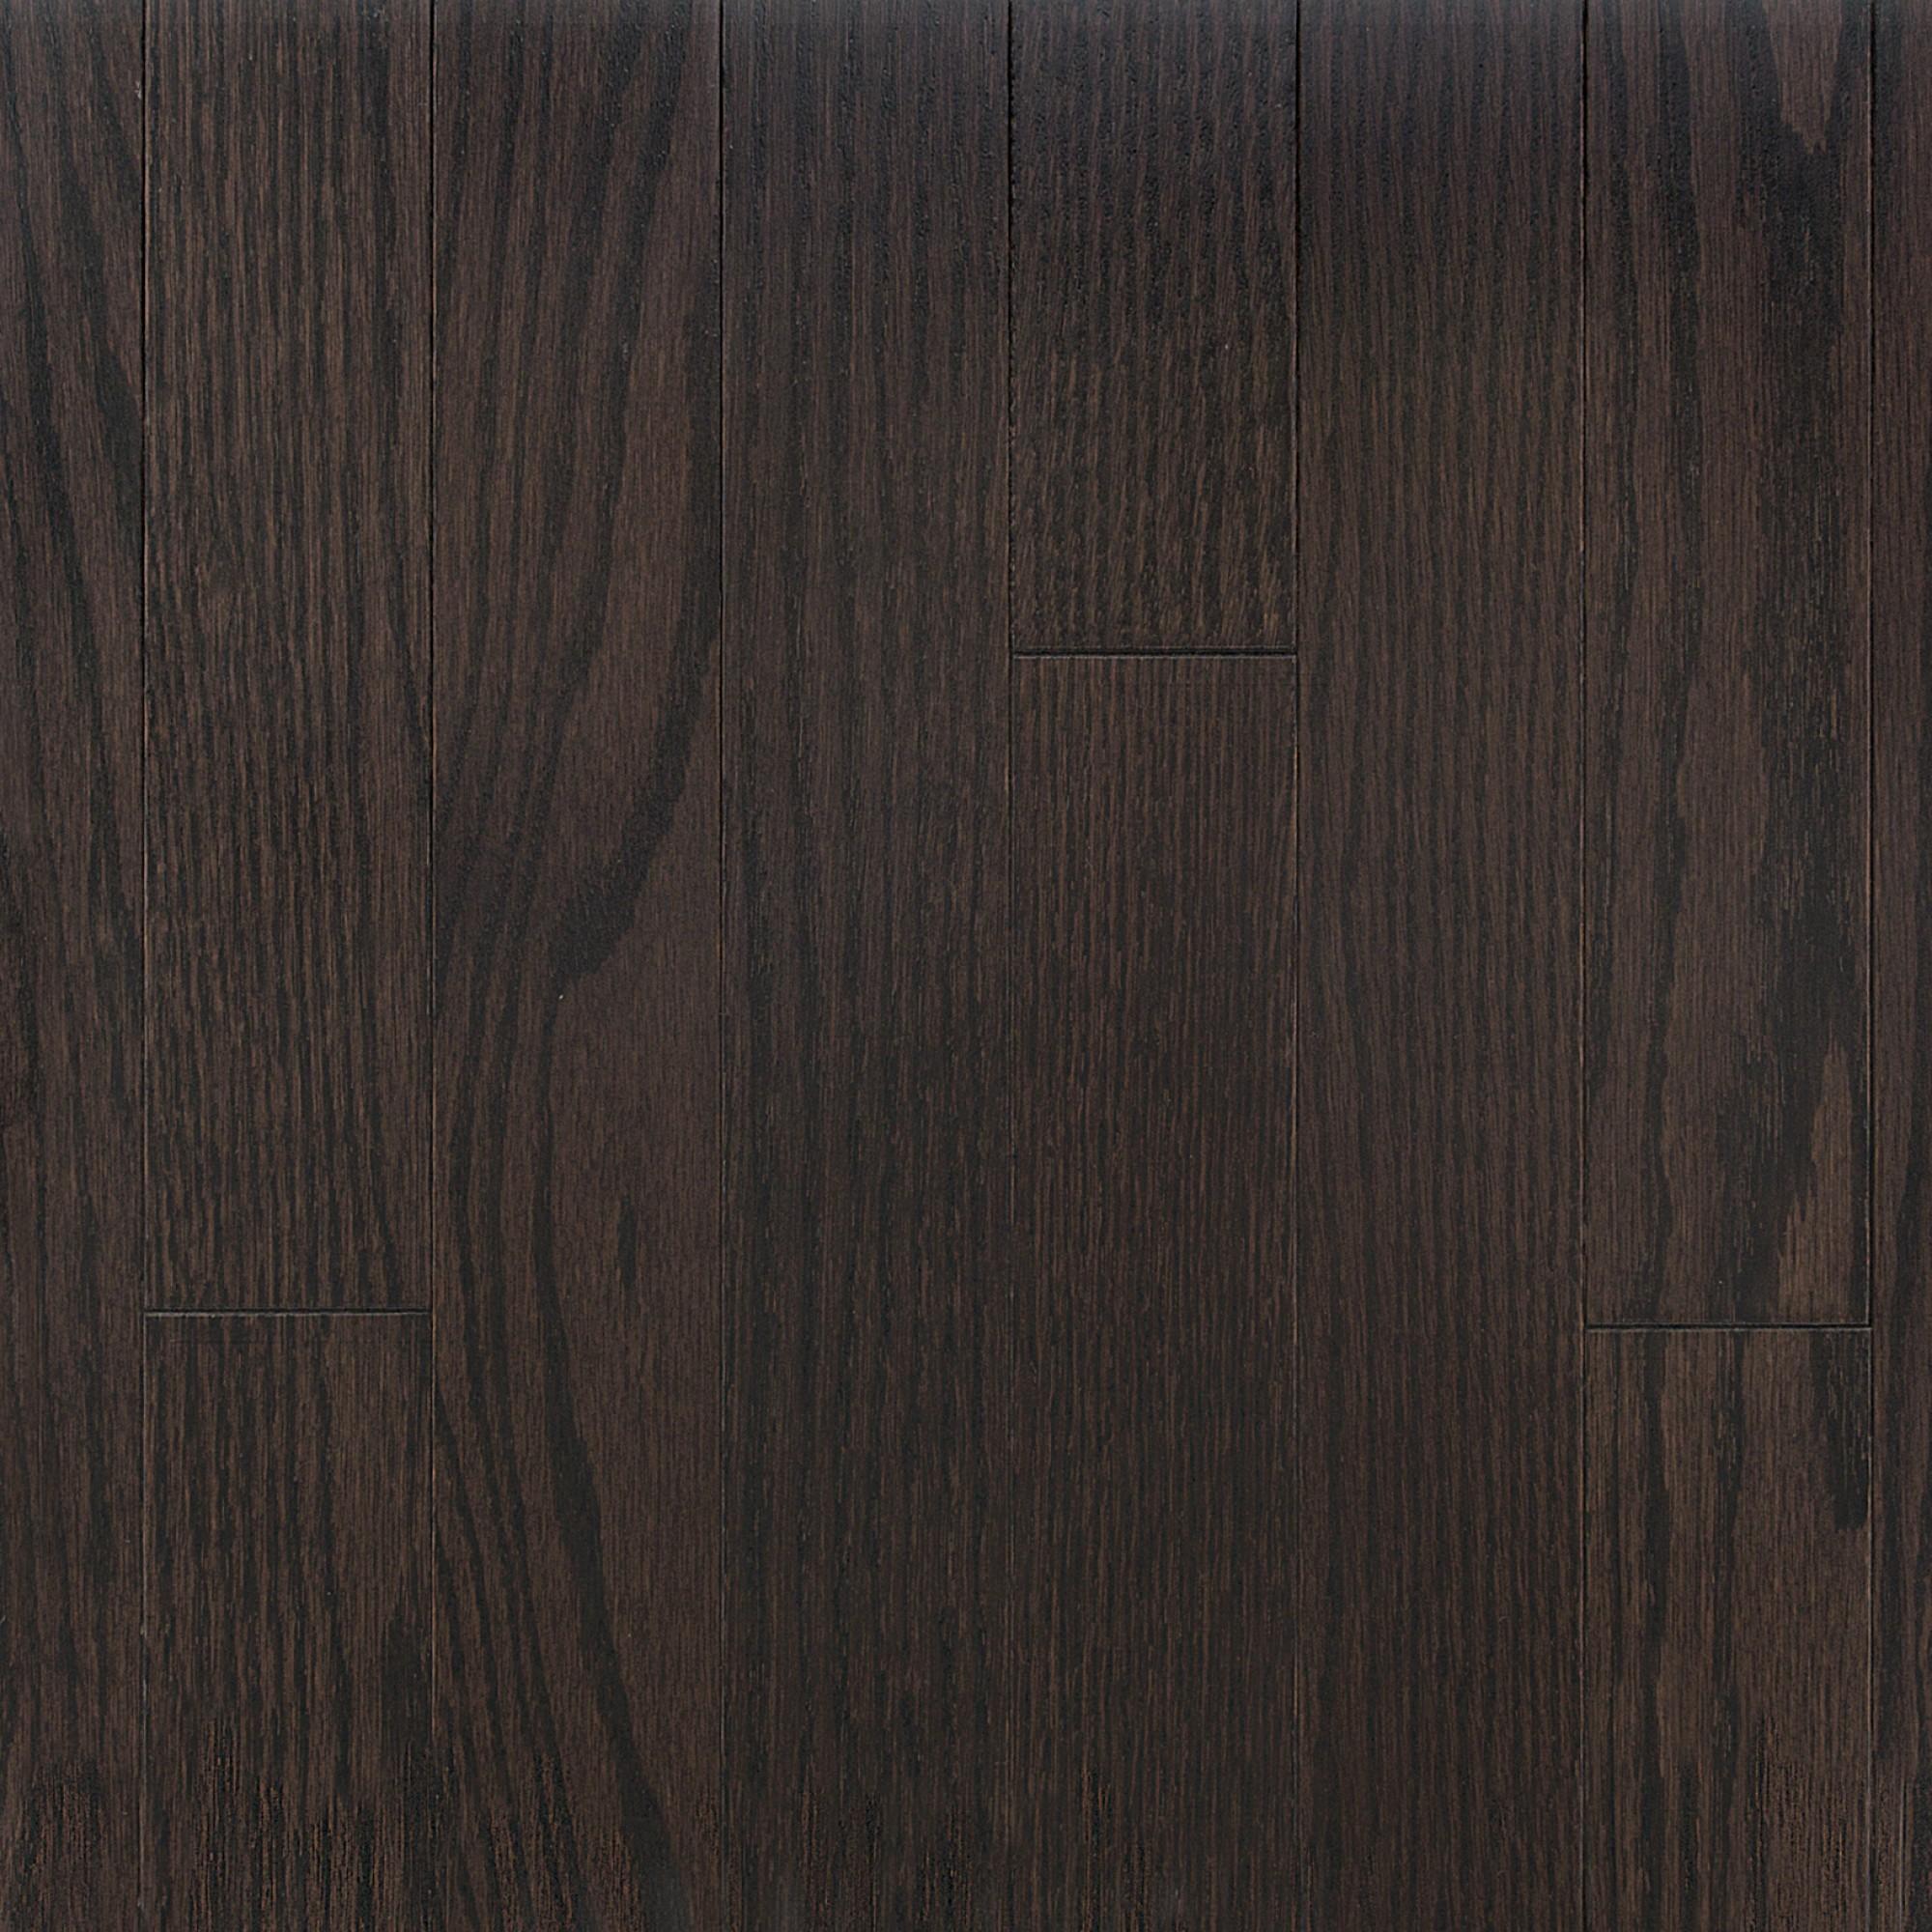 Smooth Red Oak Cocoa Vintage Hardwood Flooring